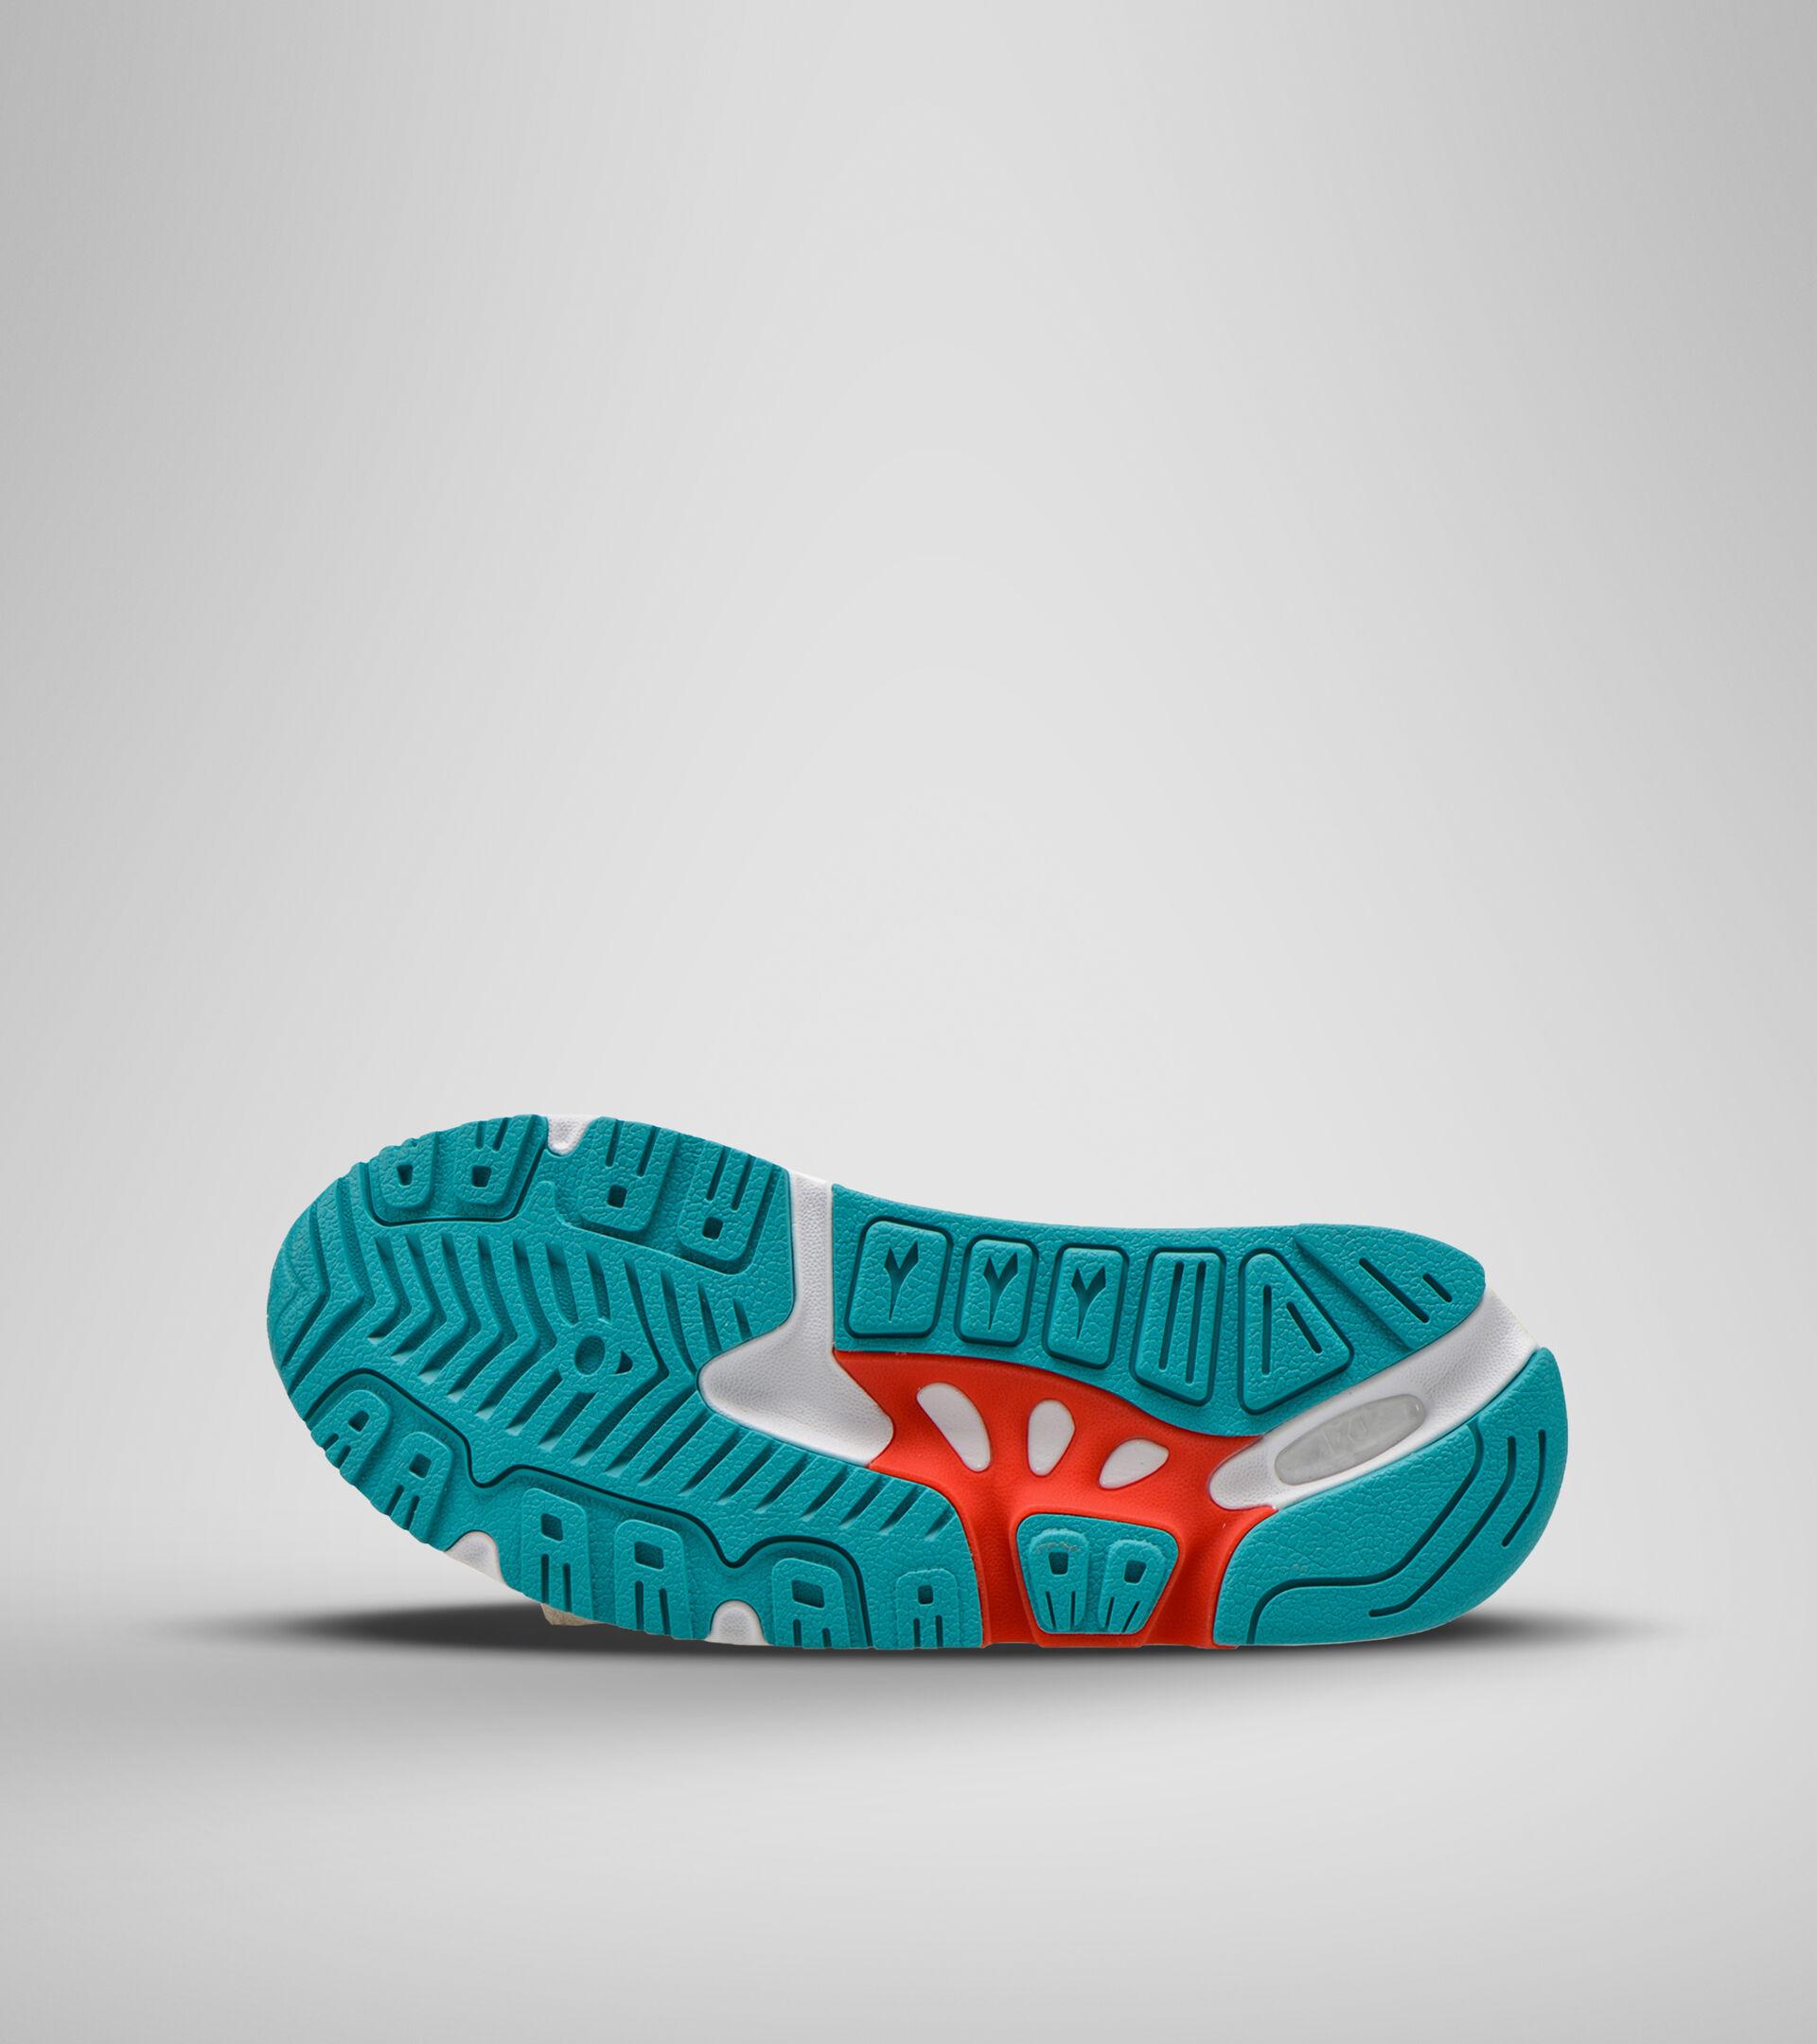 Footwear Sportswear UOMO MYTHOS OUTDOOR BLANCA OSTRA Diadora